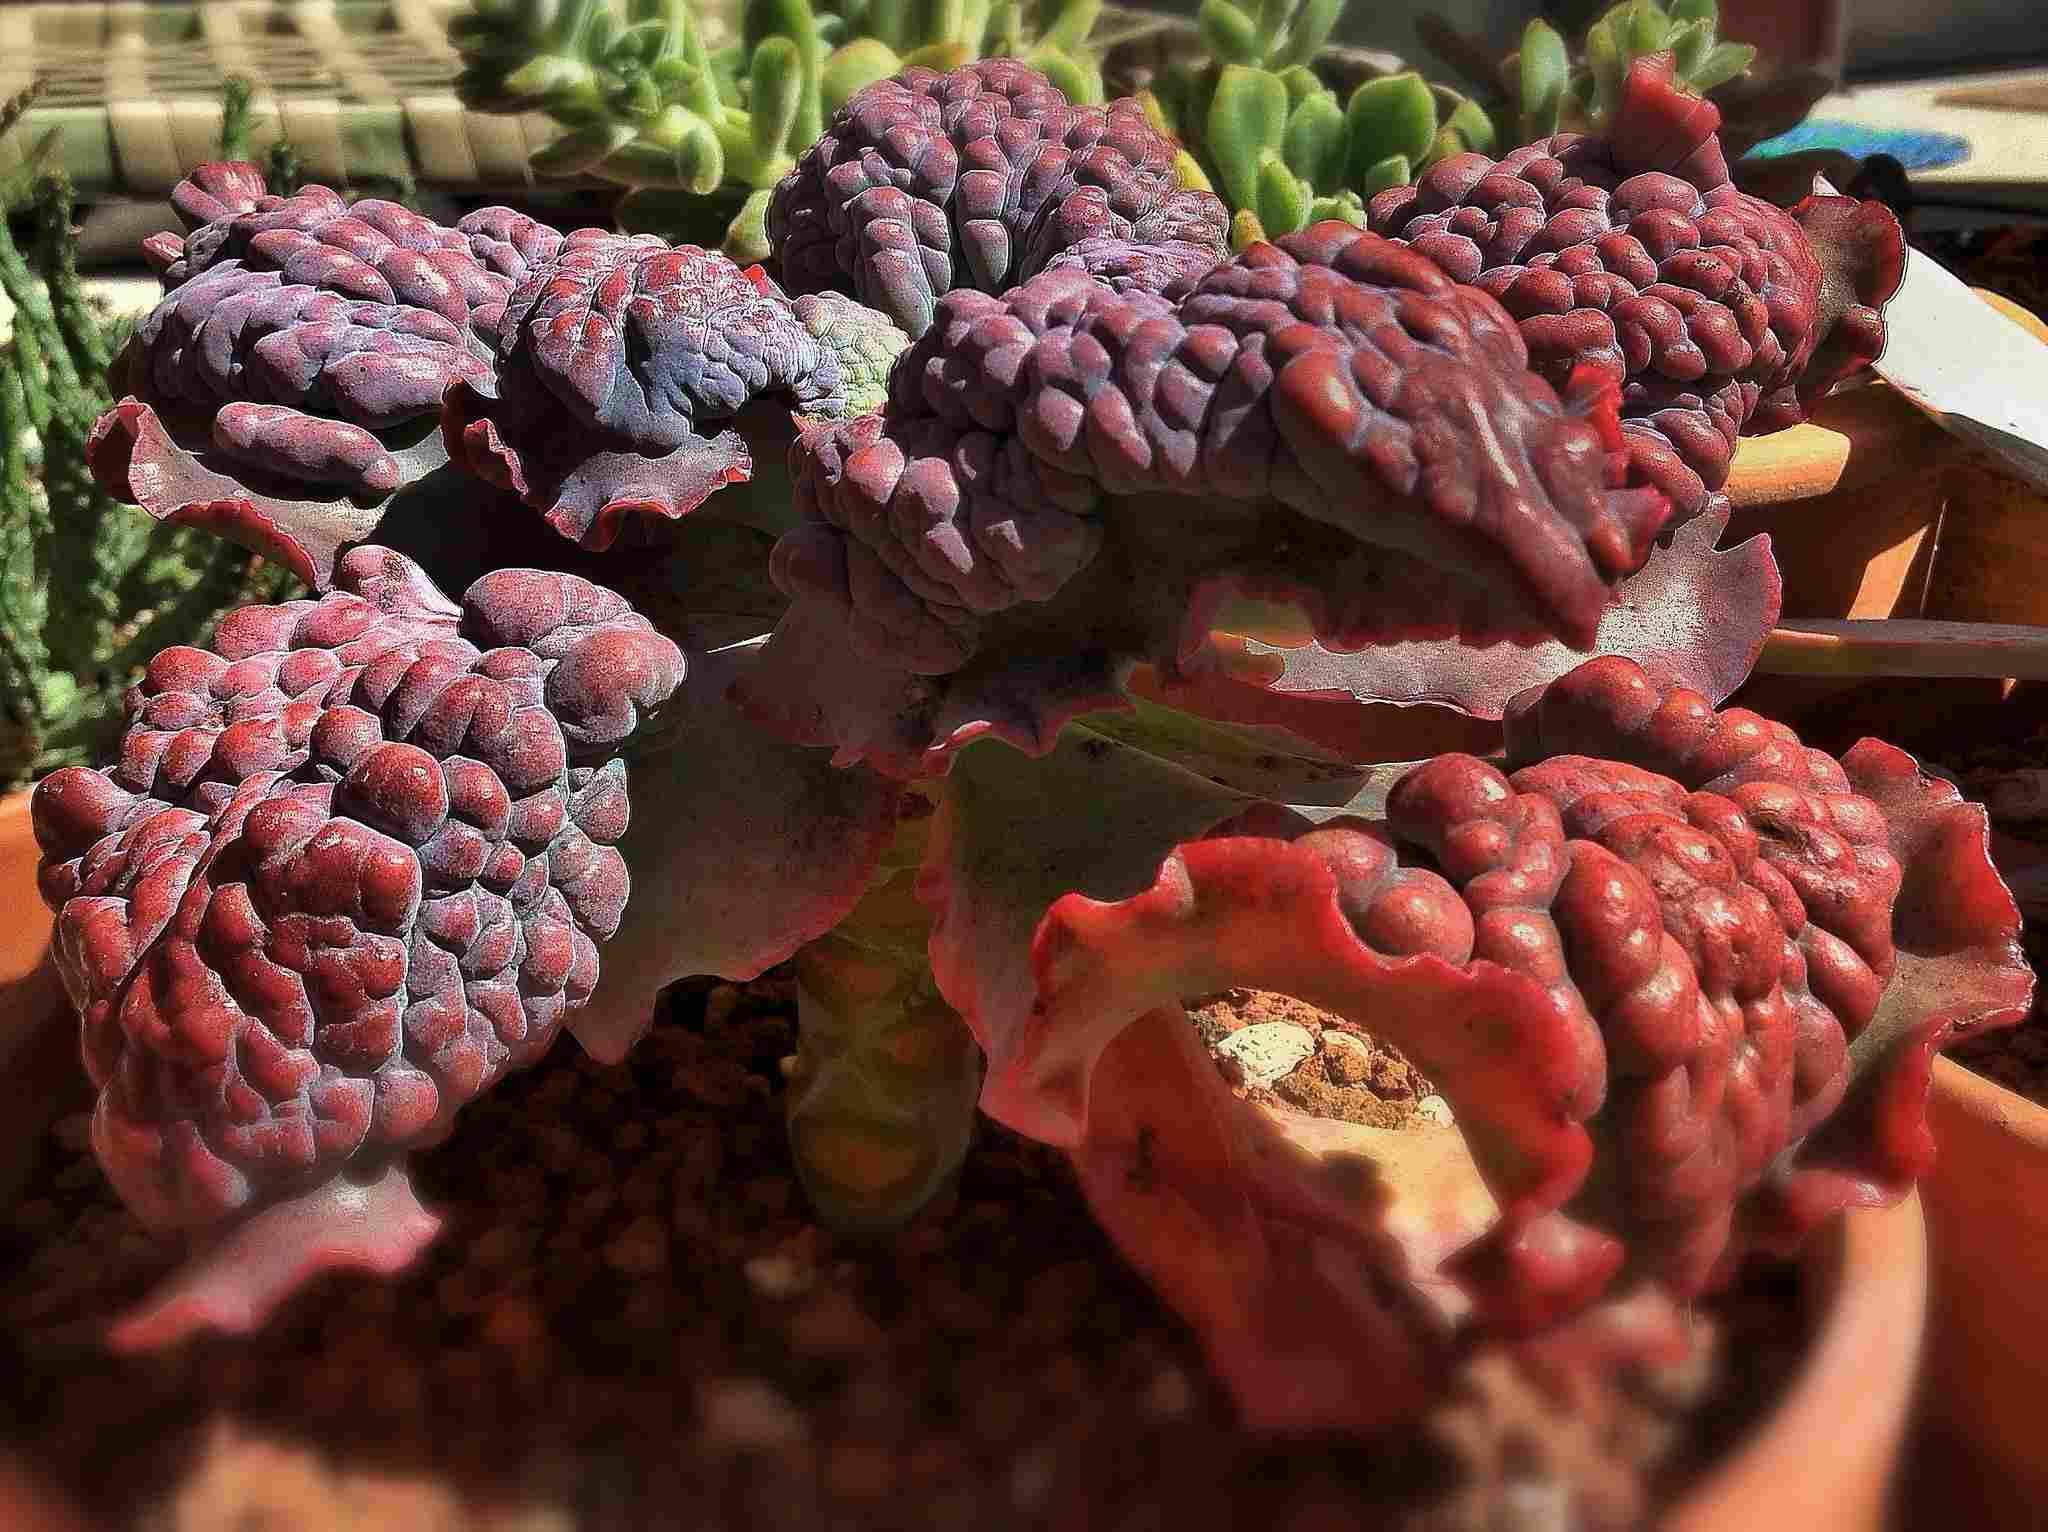 Echeveria gibbiflora 'Barbillion' in outdoor pots.